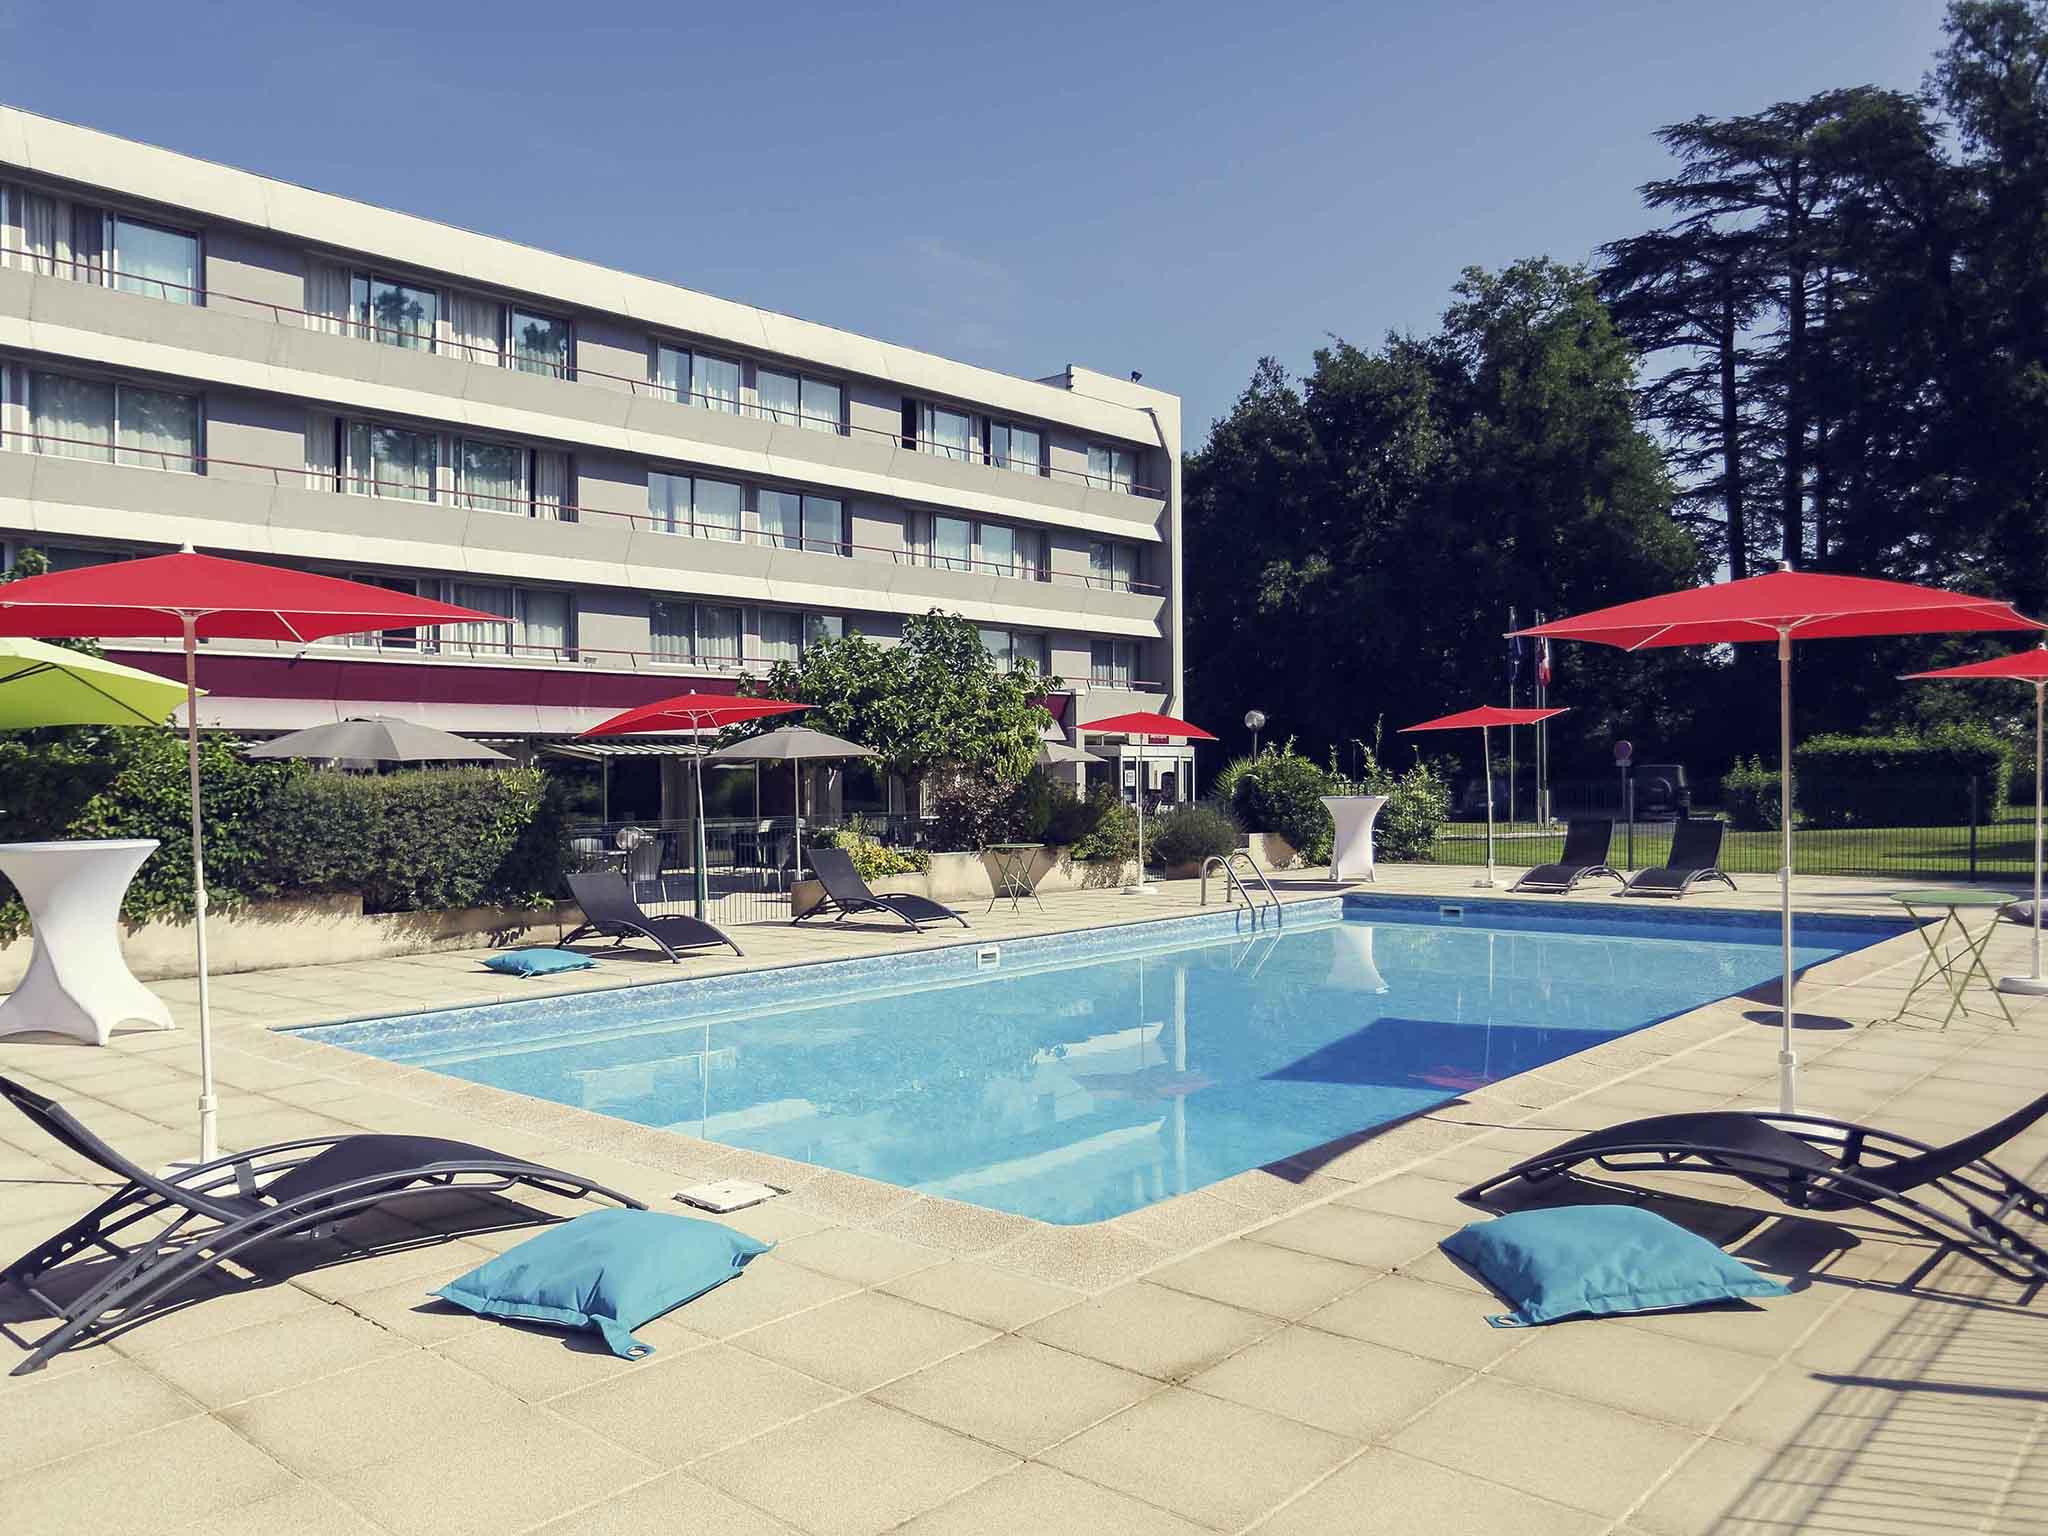 Hotell – Hôtel Mercure Brive